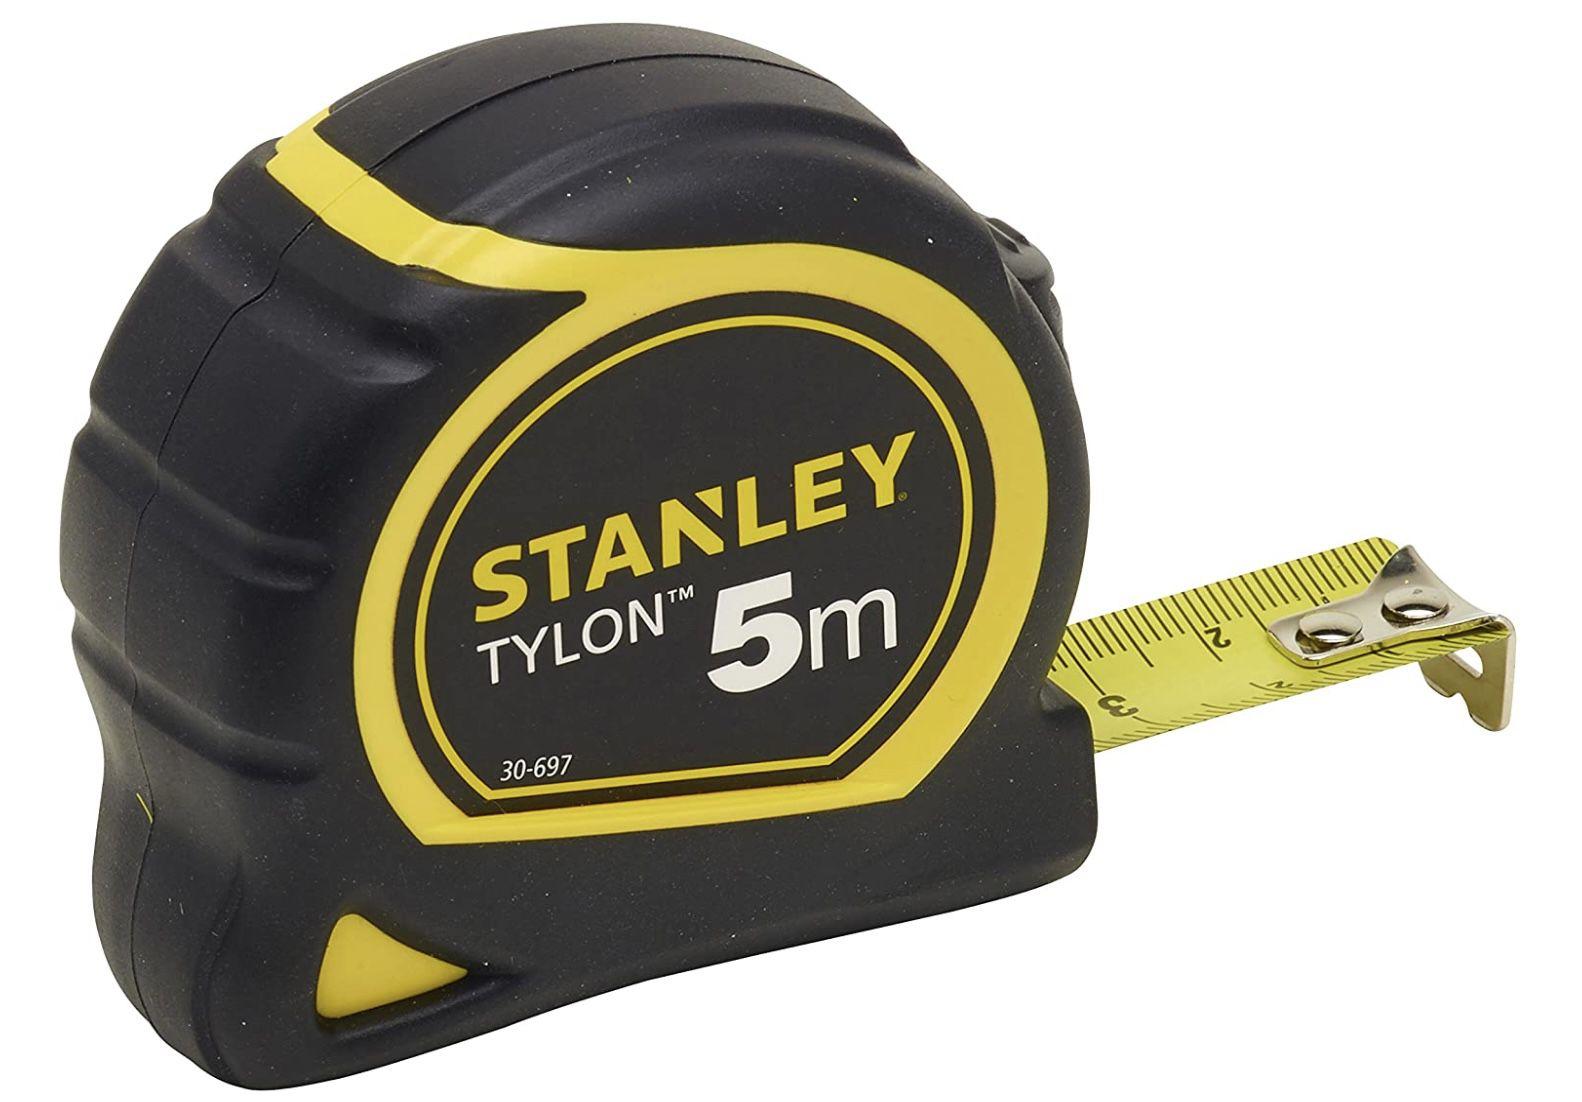 Stanley 5m Bandmaß Tylon für 6,28€ (statt 11€)